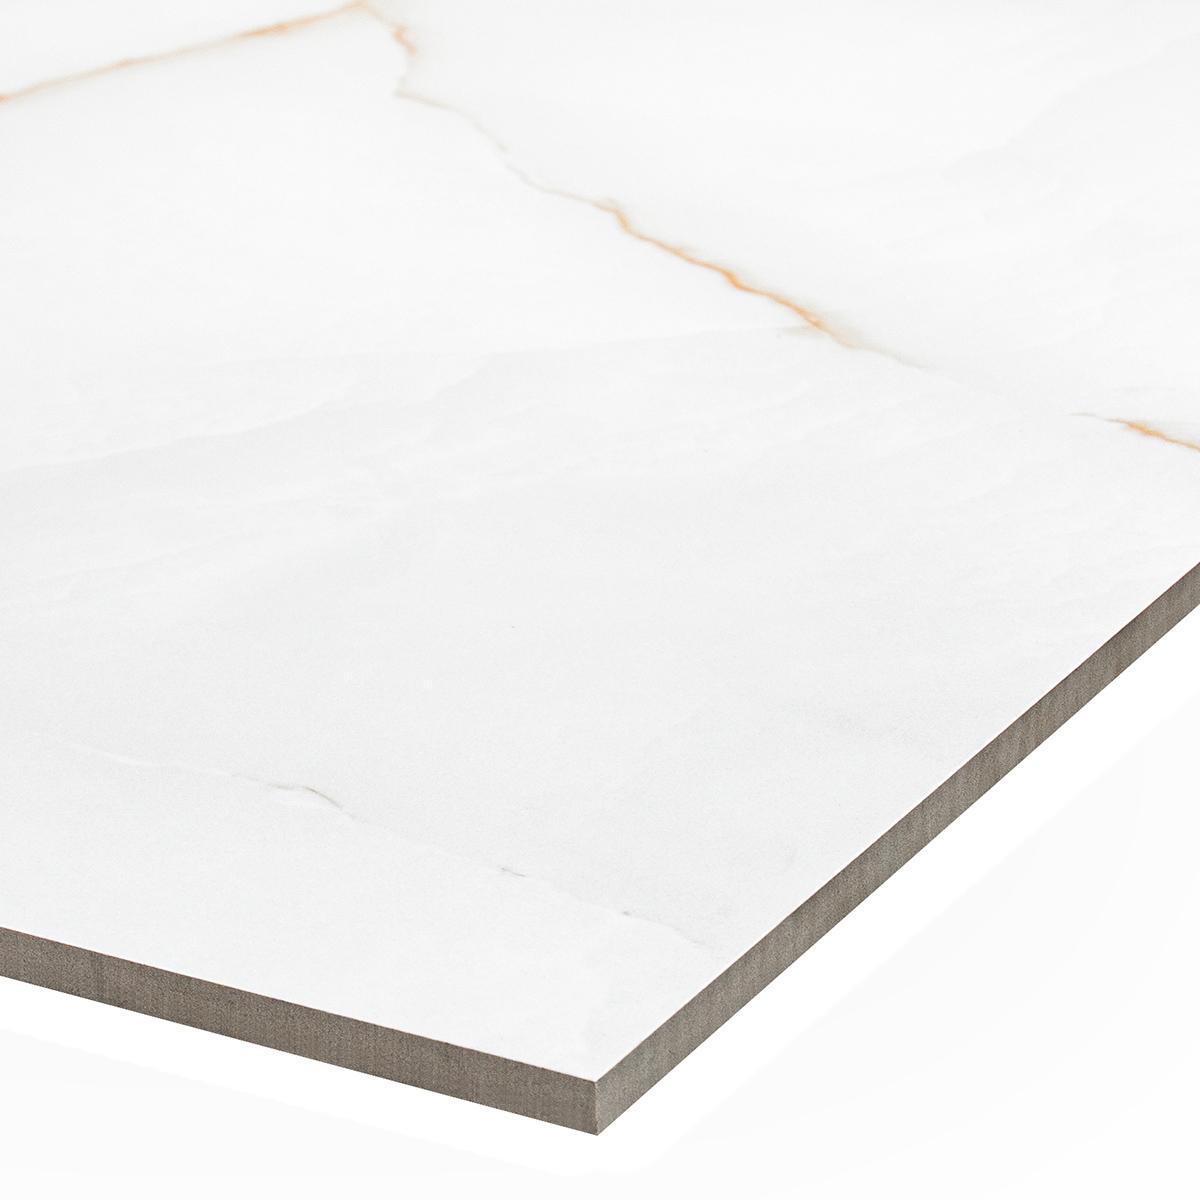 Porcelanato Jupiter Blanco Brillante - 60X120 cm - 1.44 m2